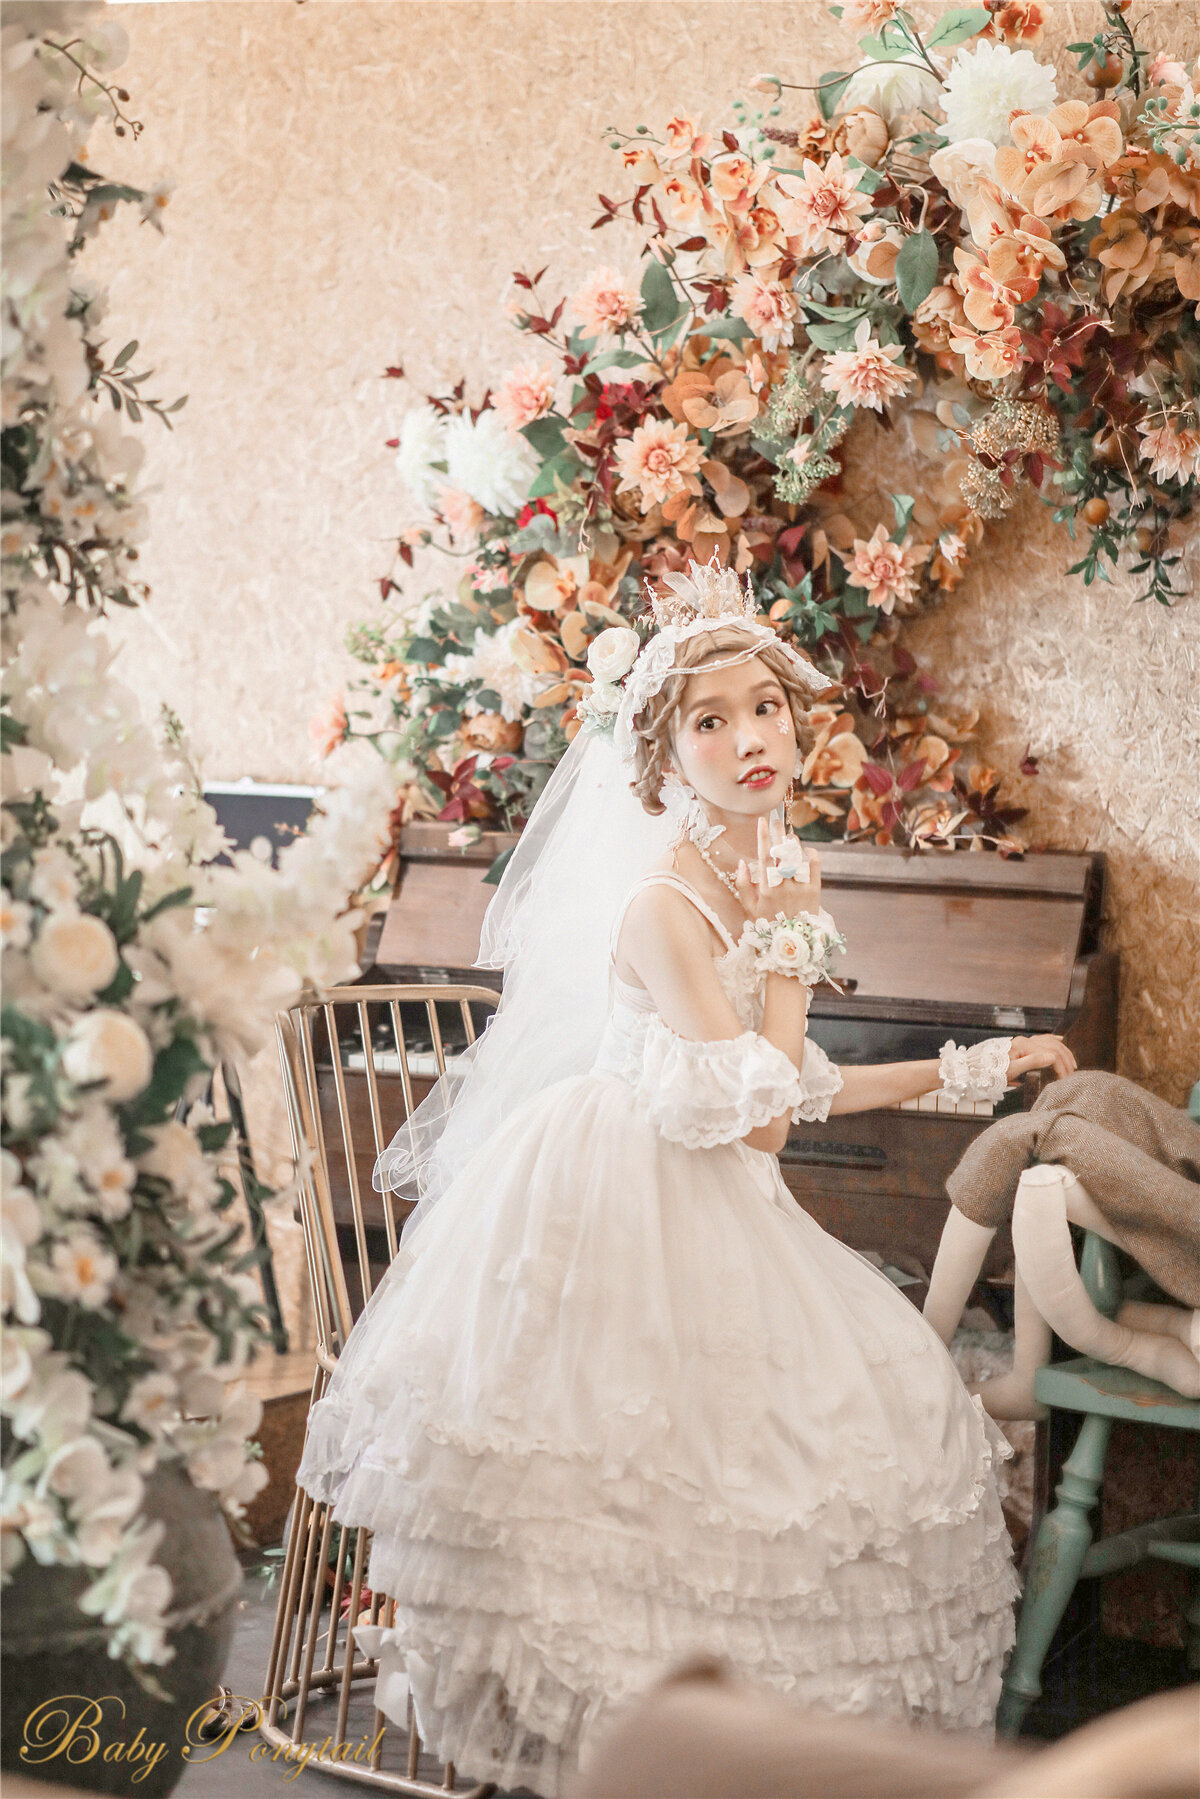 Babyponytail_Heavenly Teardrops_Model photo_JSK white_kaka_09.jpg